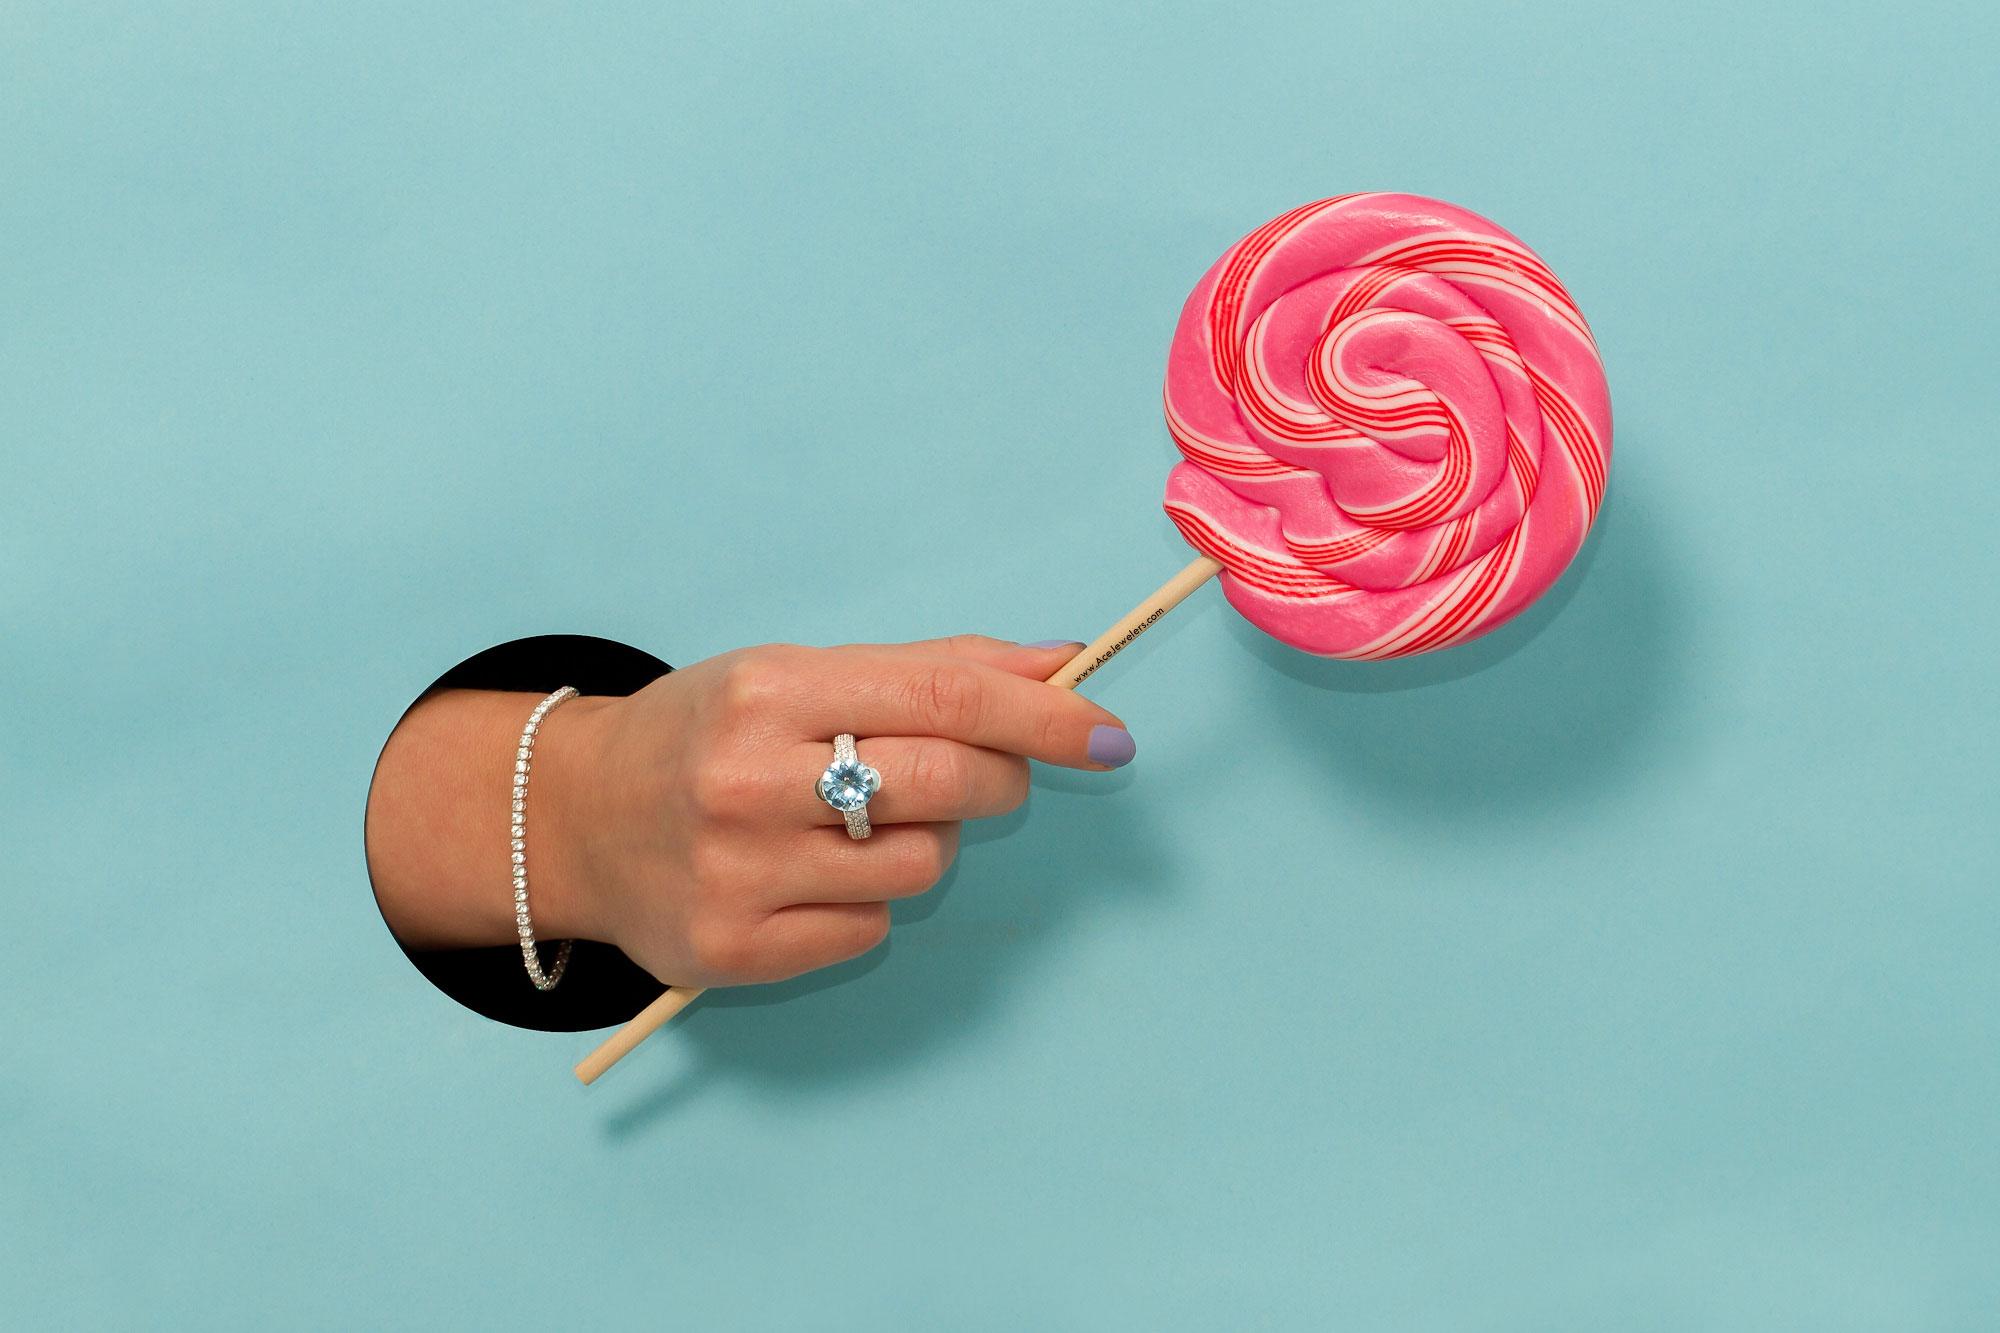 candy-crush-0024-4